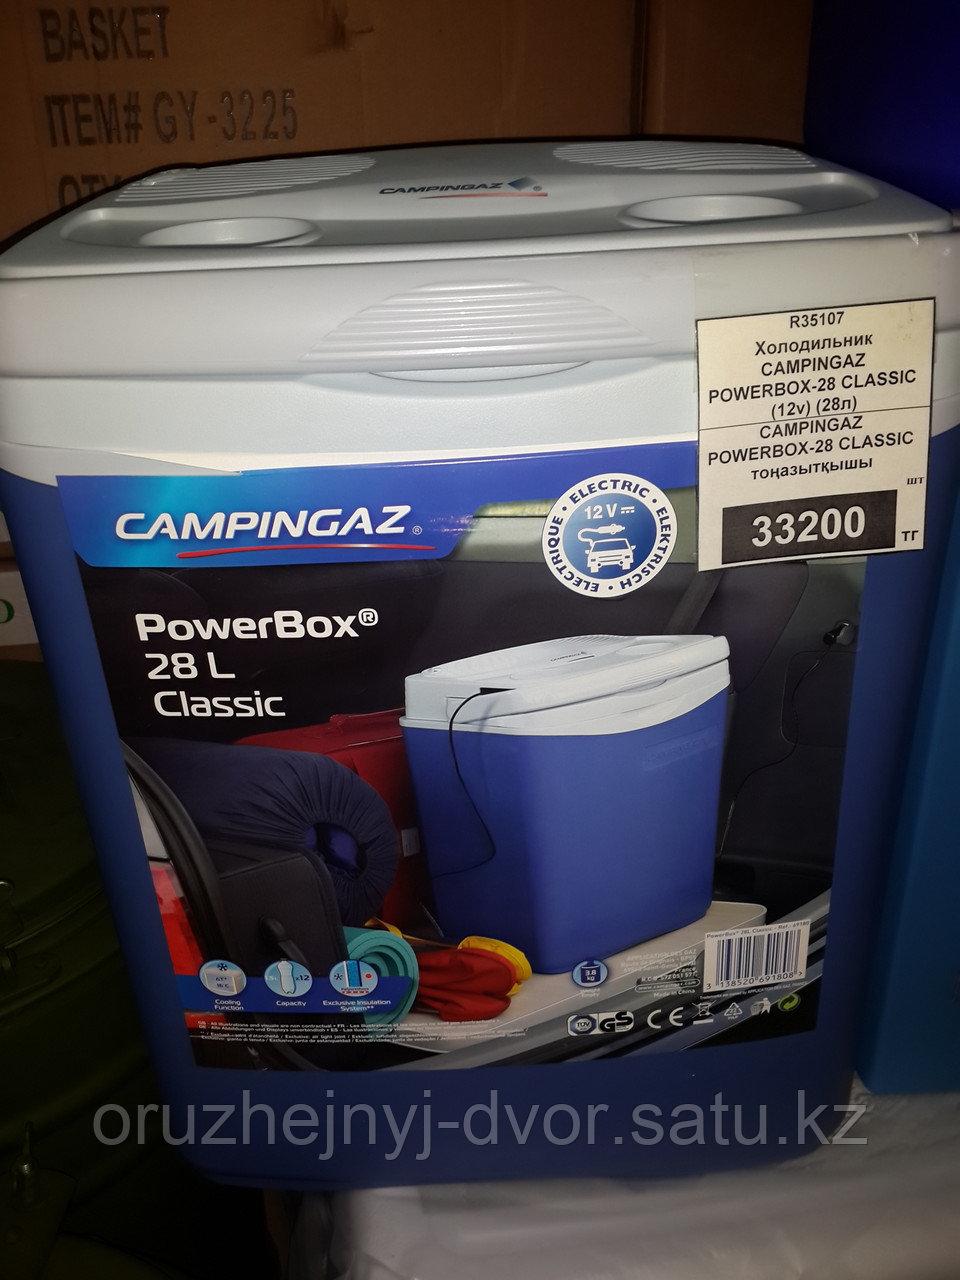 Холодильник CAMPINGAZ POWERBOX-28 CLASSIC (12v)